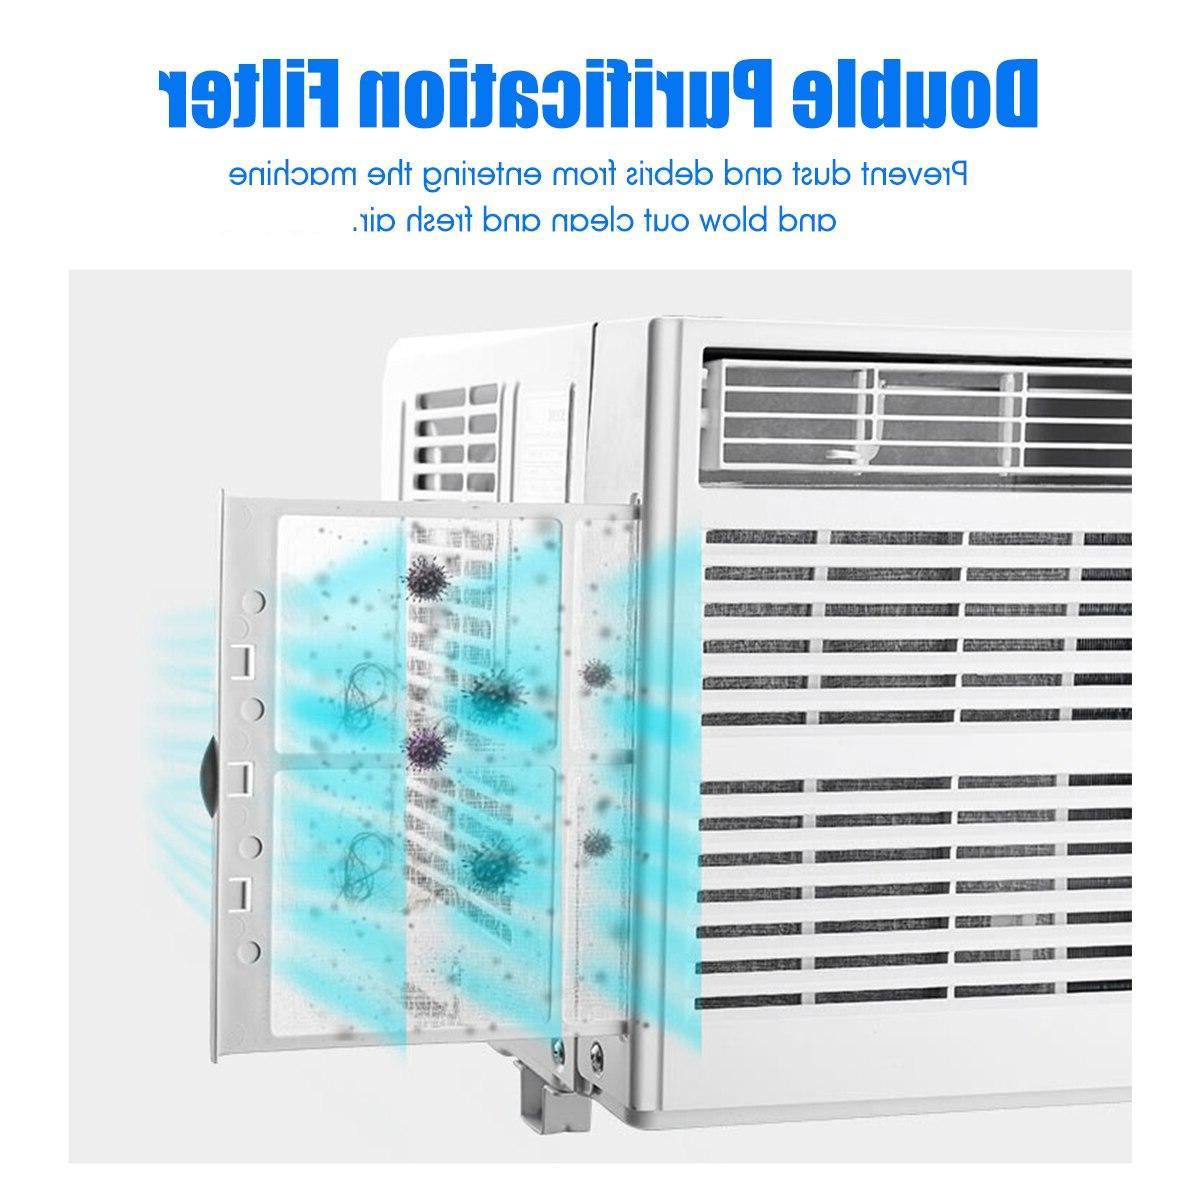 Newest Portable <font><b>Heater</b></font> Window Heating Cold/Heat Dehumidification 220V